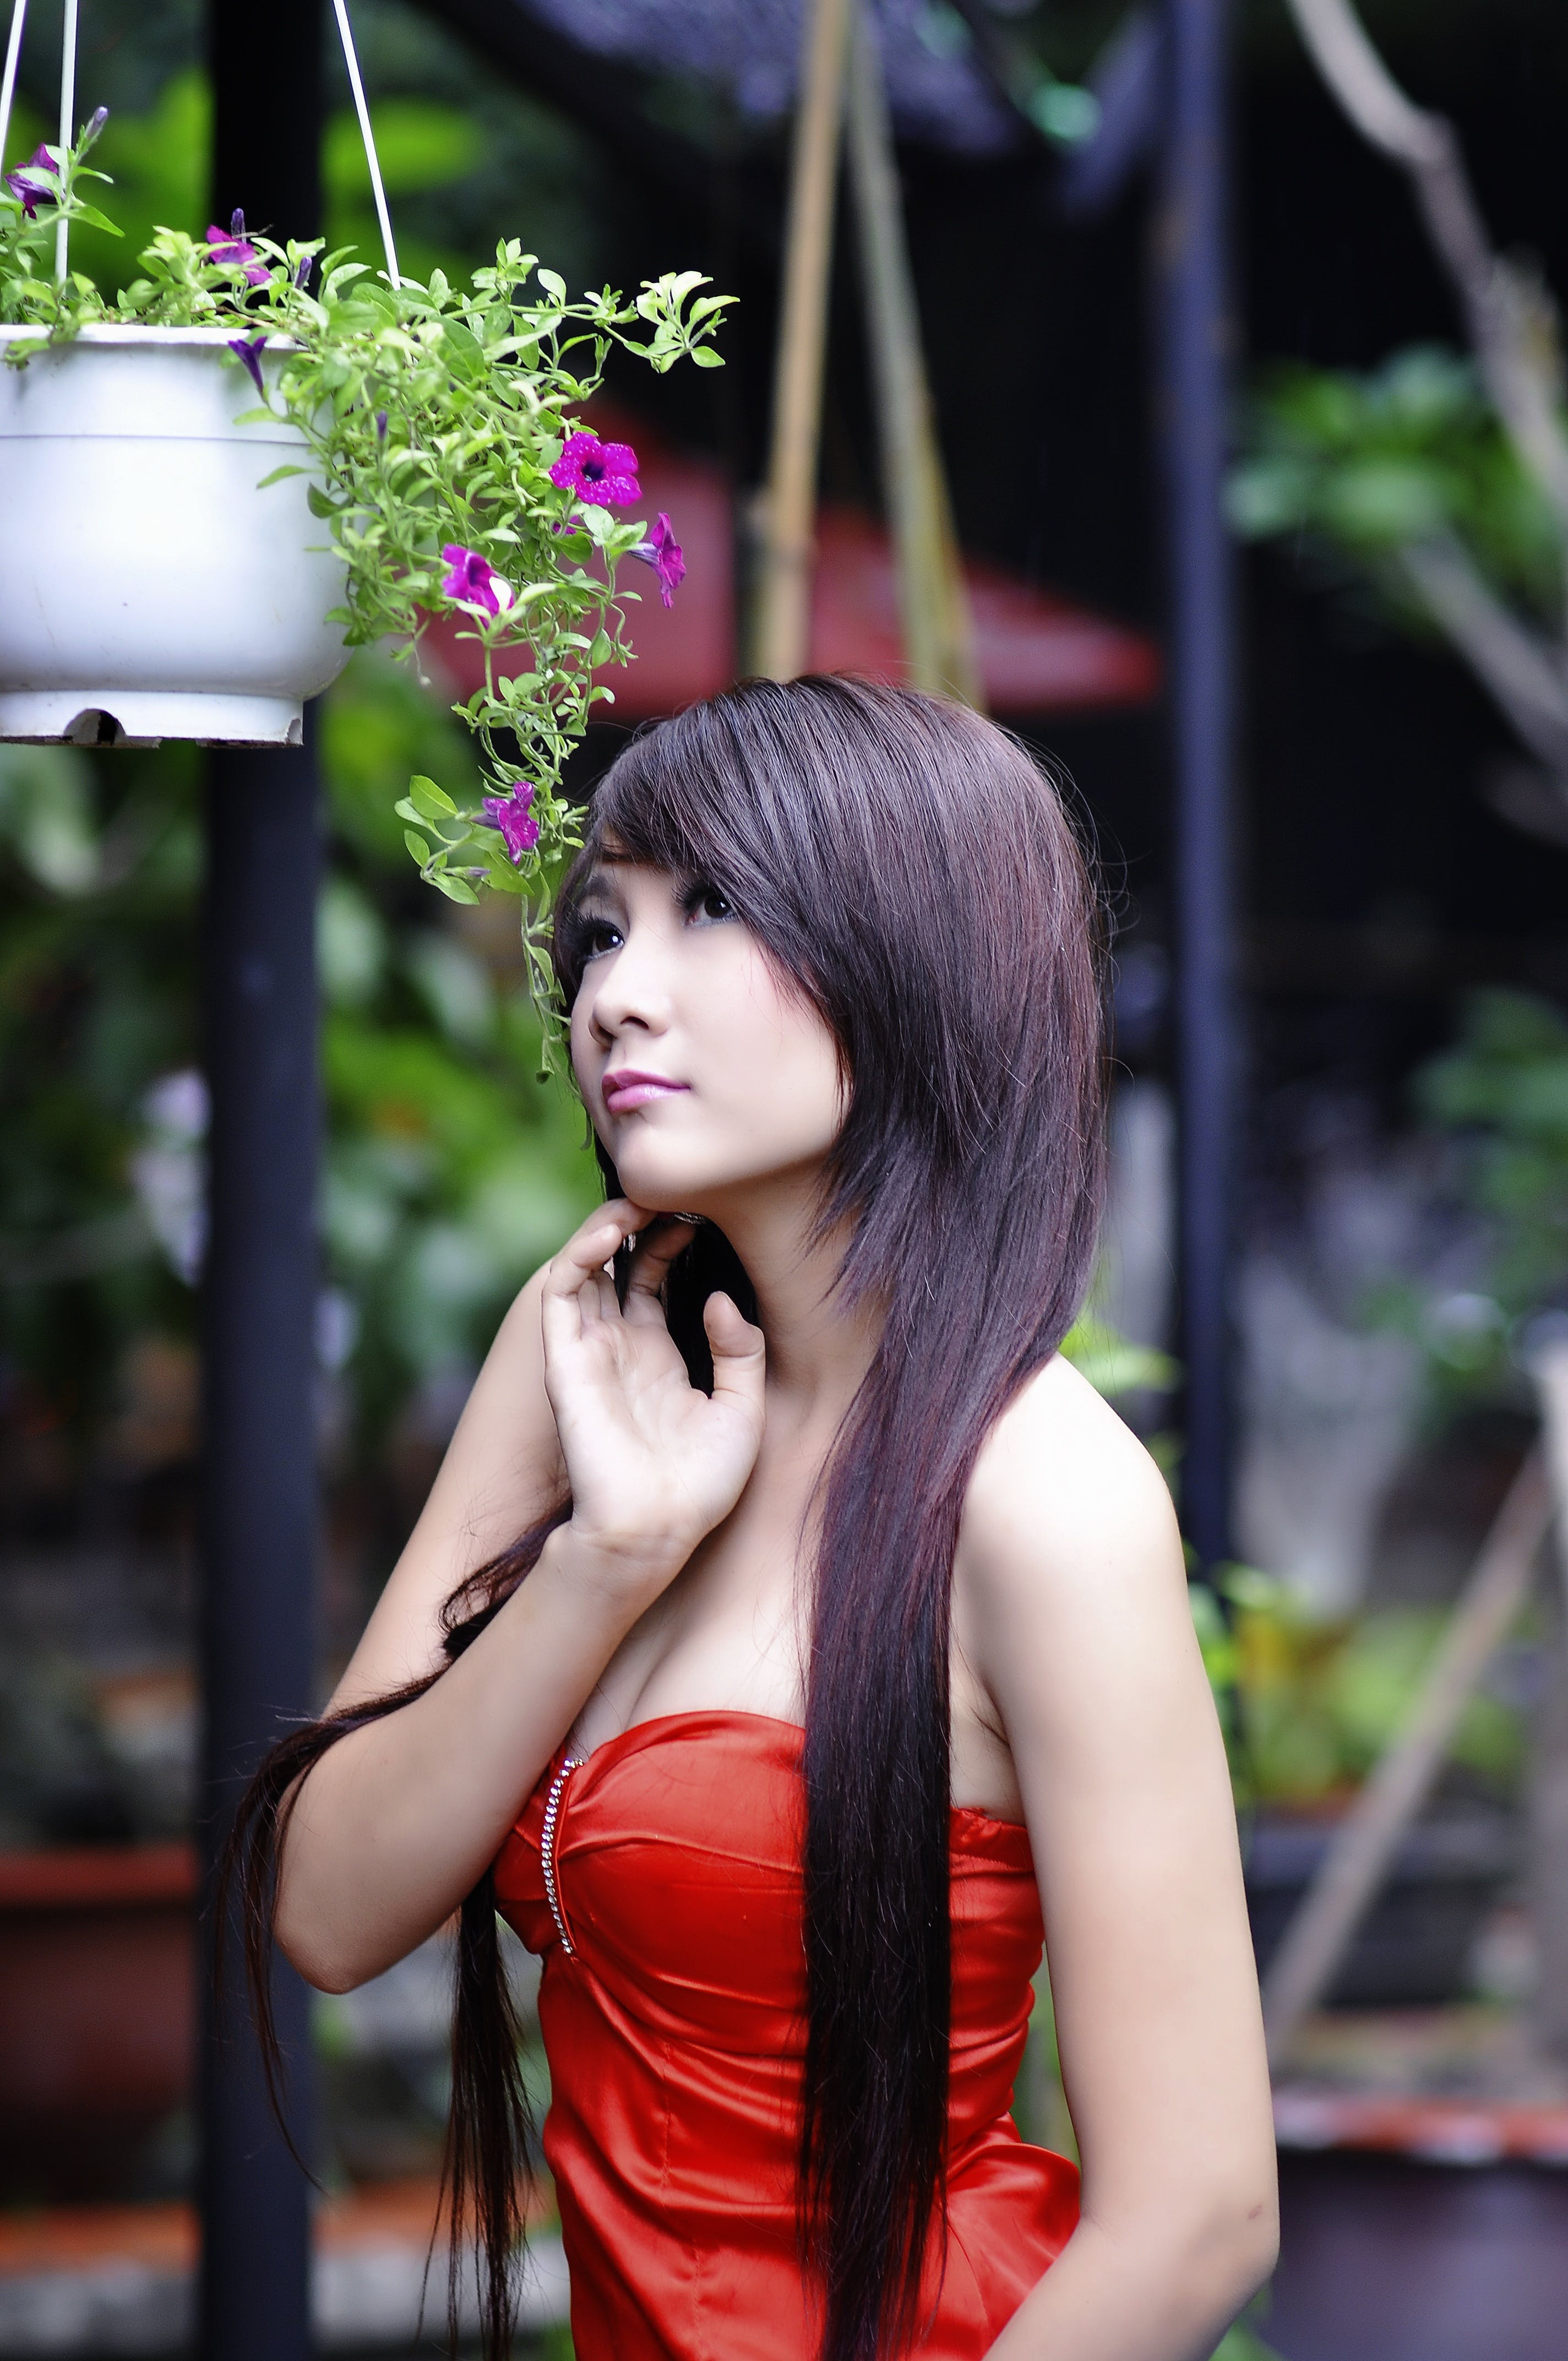 Woman Wearing Red Sweet Heart Neckline Dress Standing Near Hanging Flower Vase